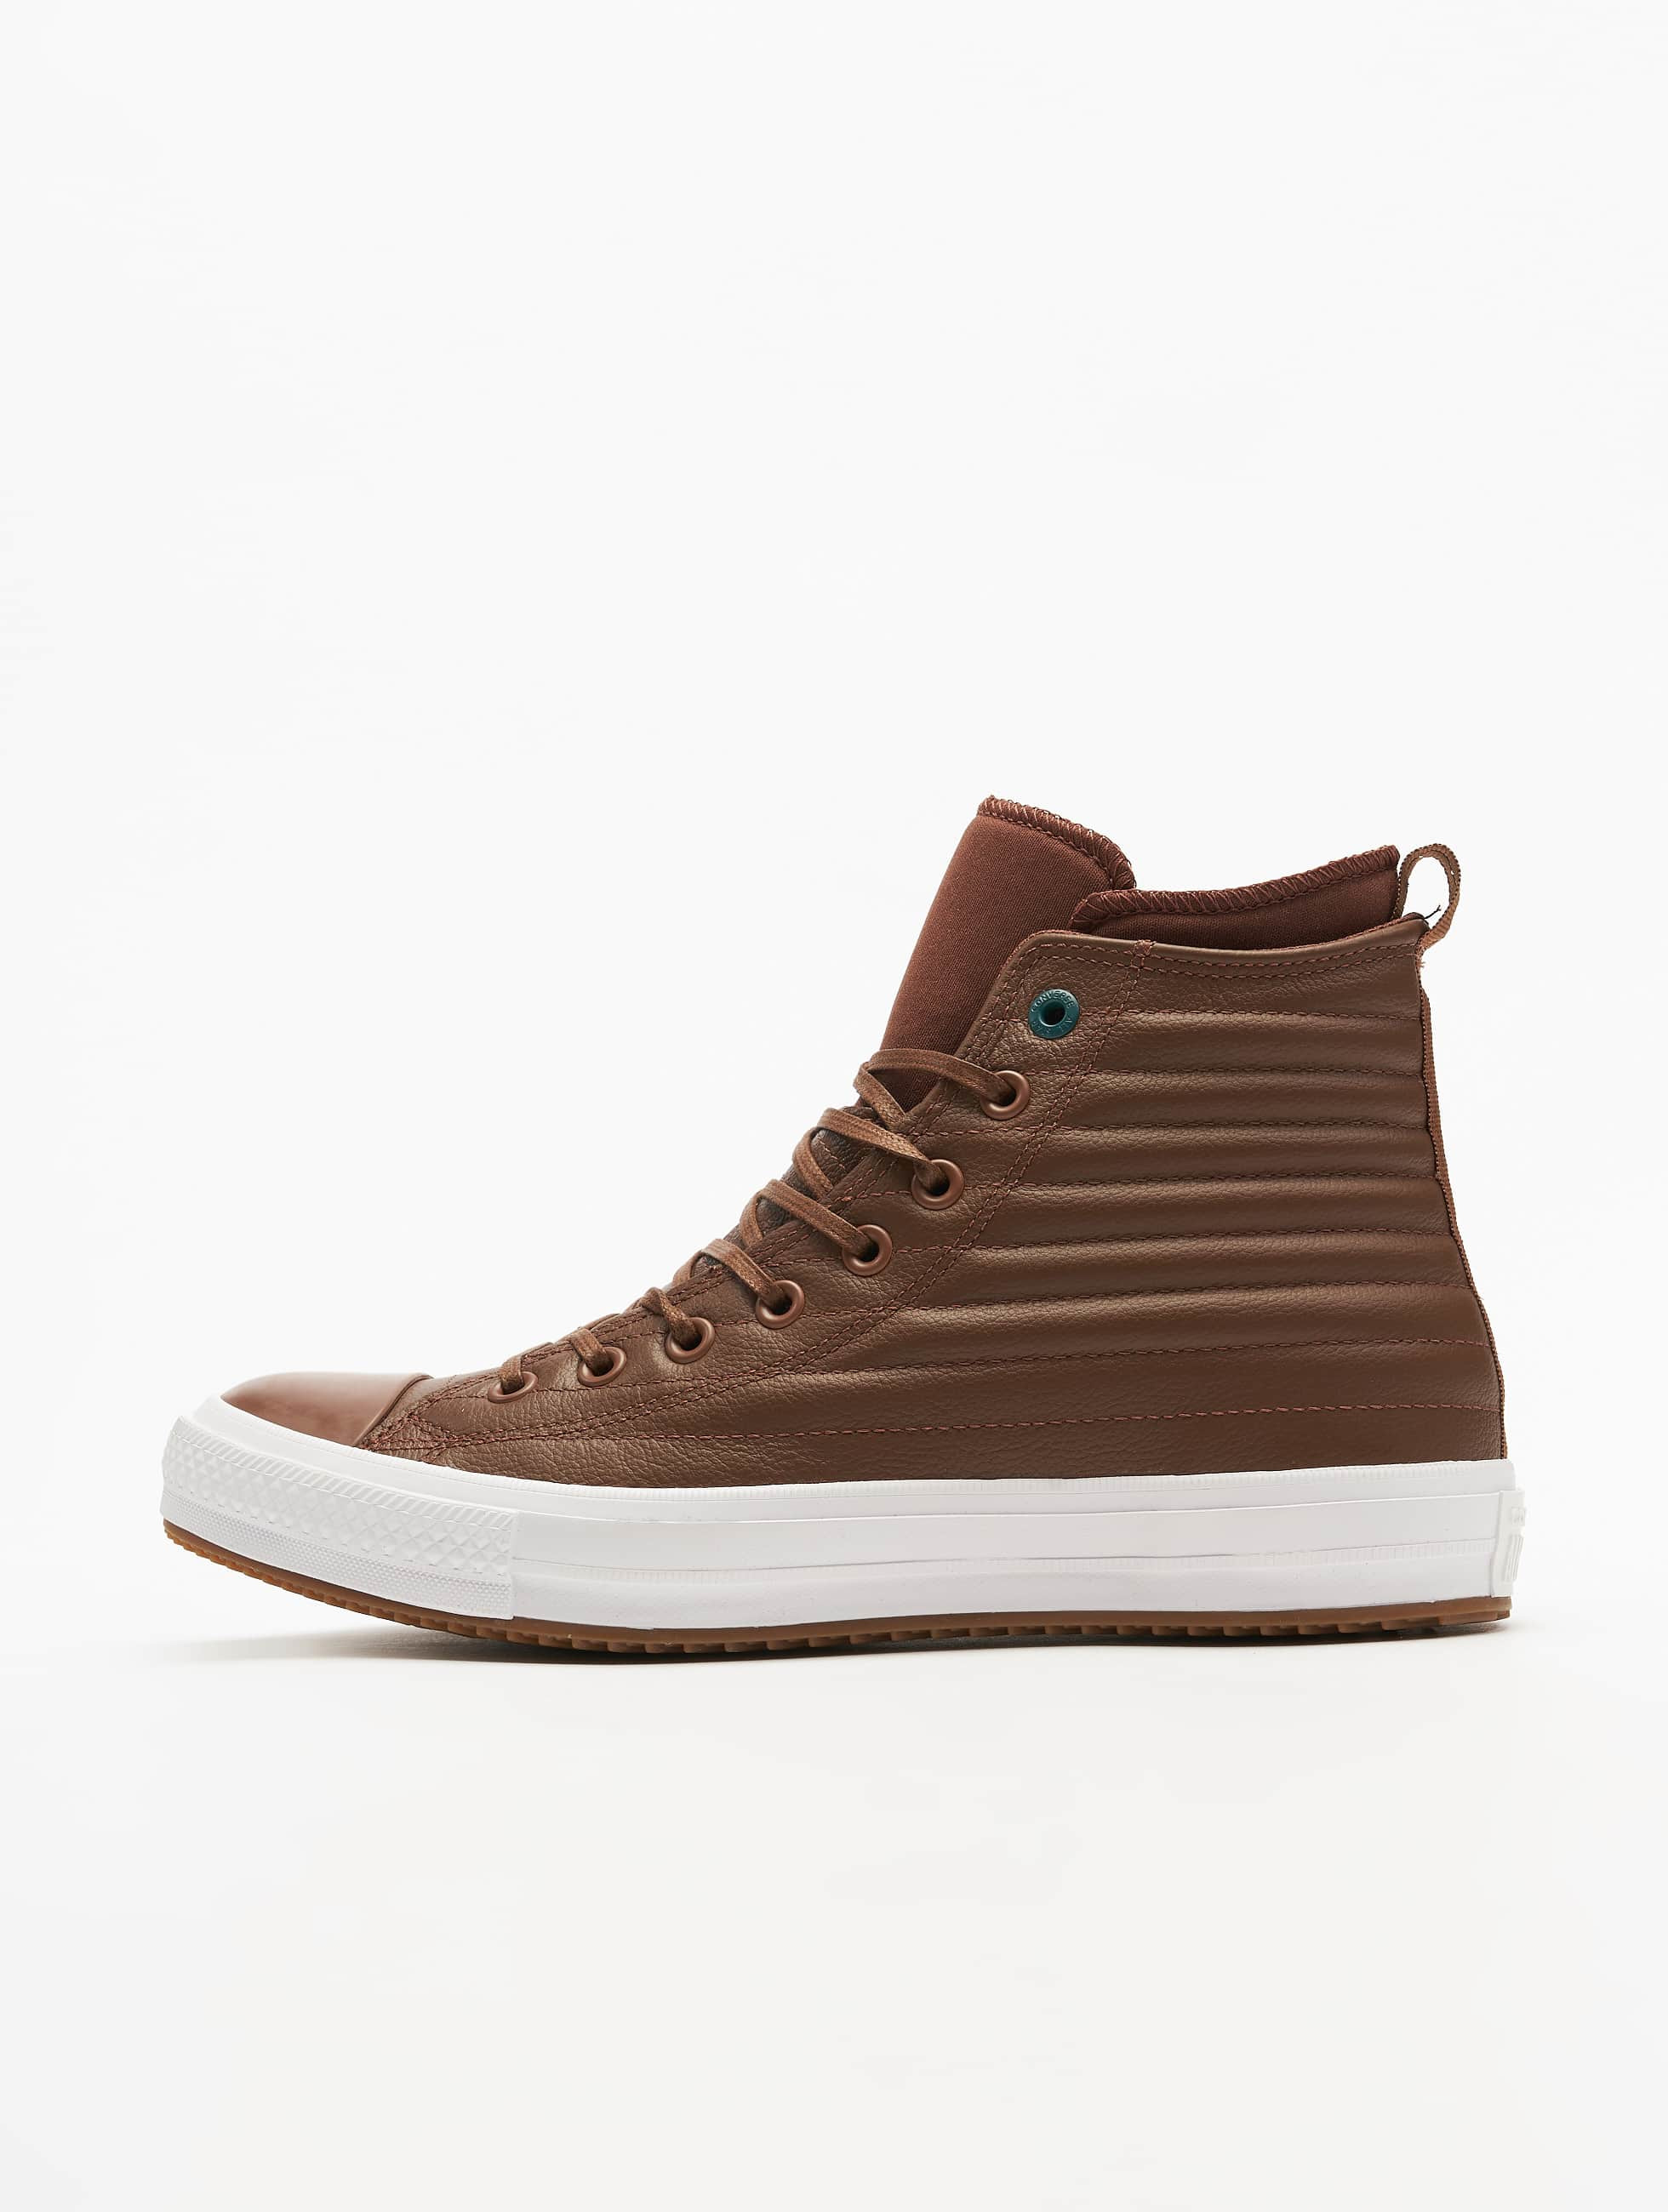 Converse Chuck Taylor WP Boot Hi Sneakers Dark CloveDark Atomic Teal